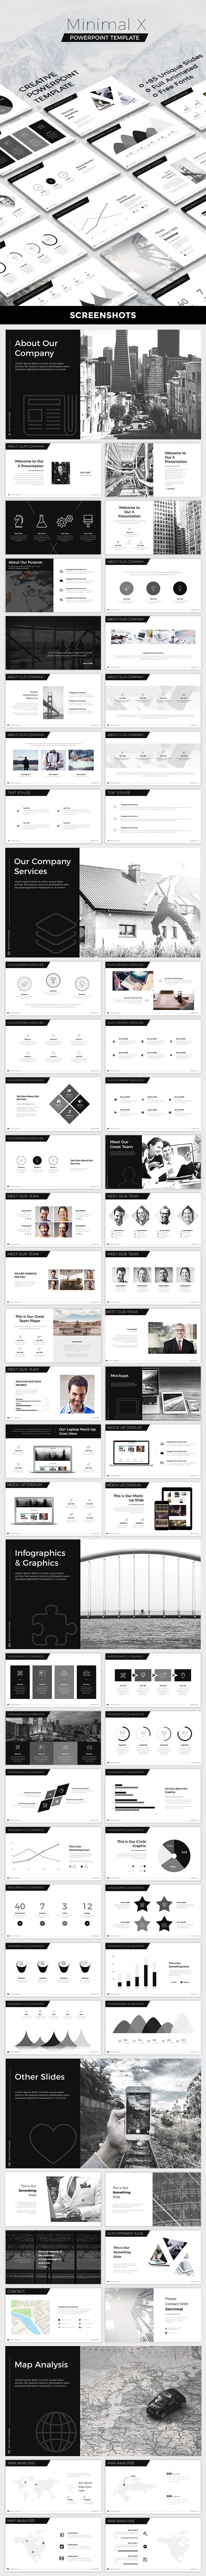 Minimal X Powerpoint Template - Creative PowerPoint Templates